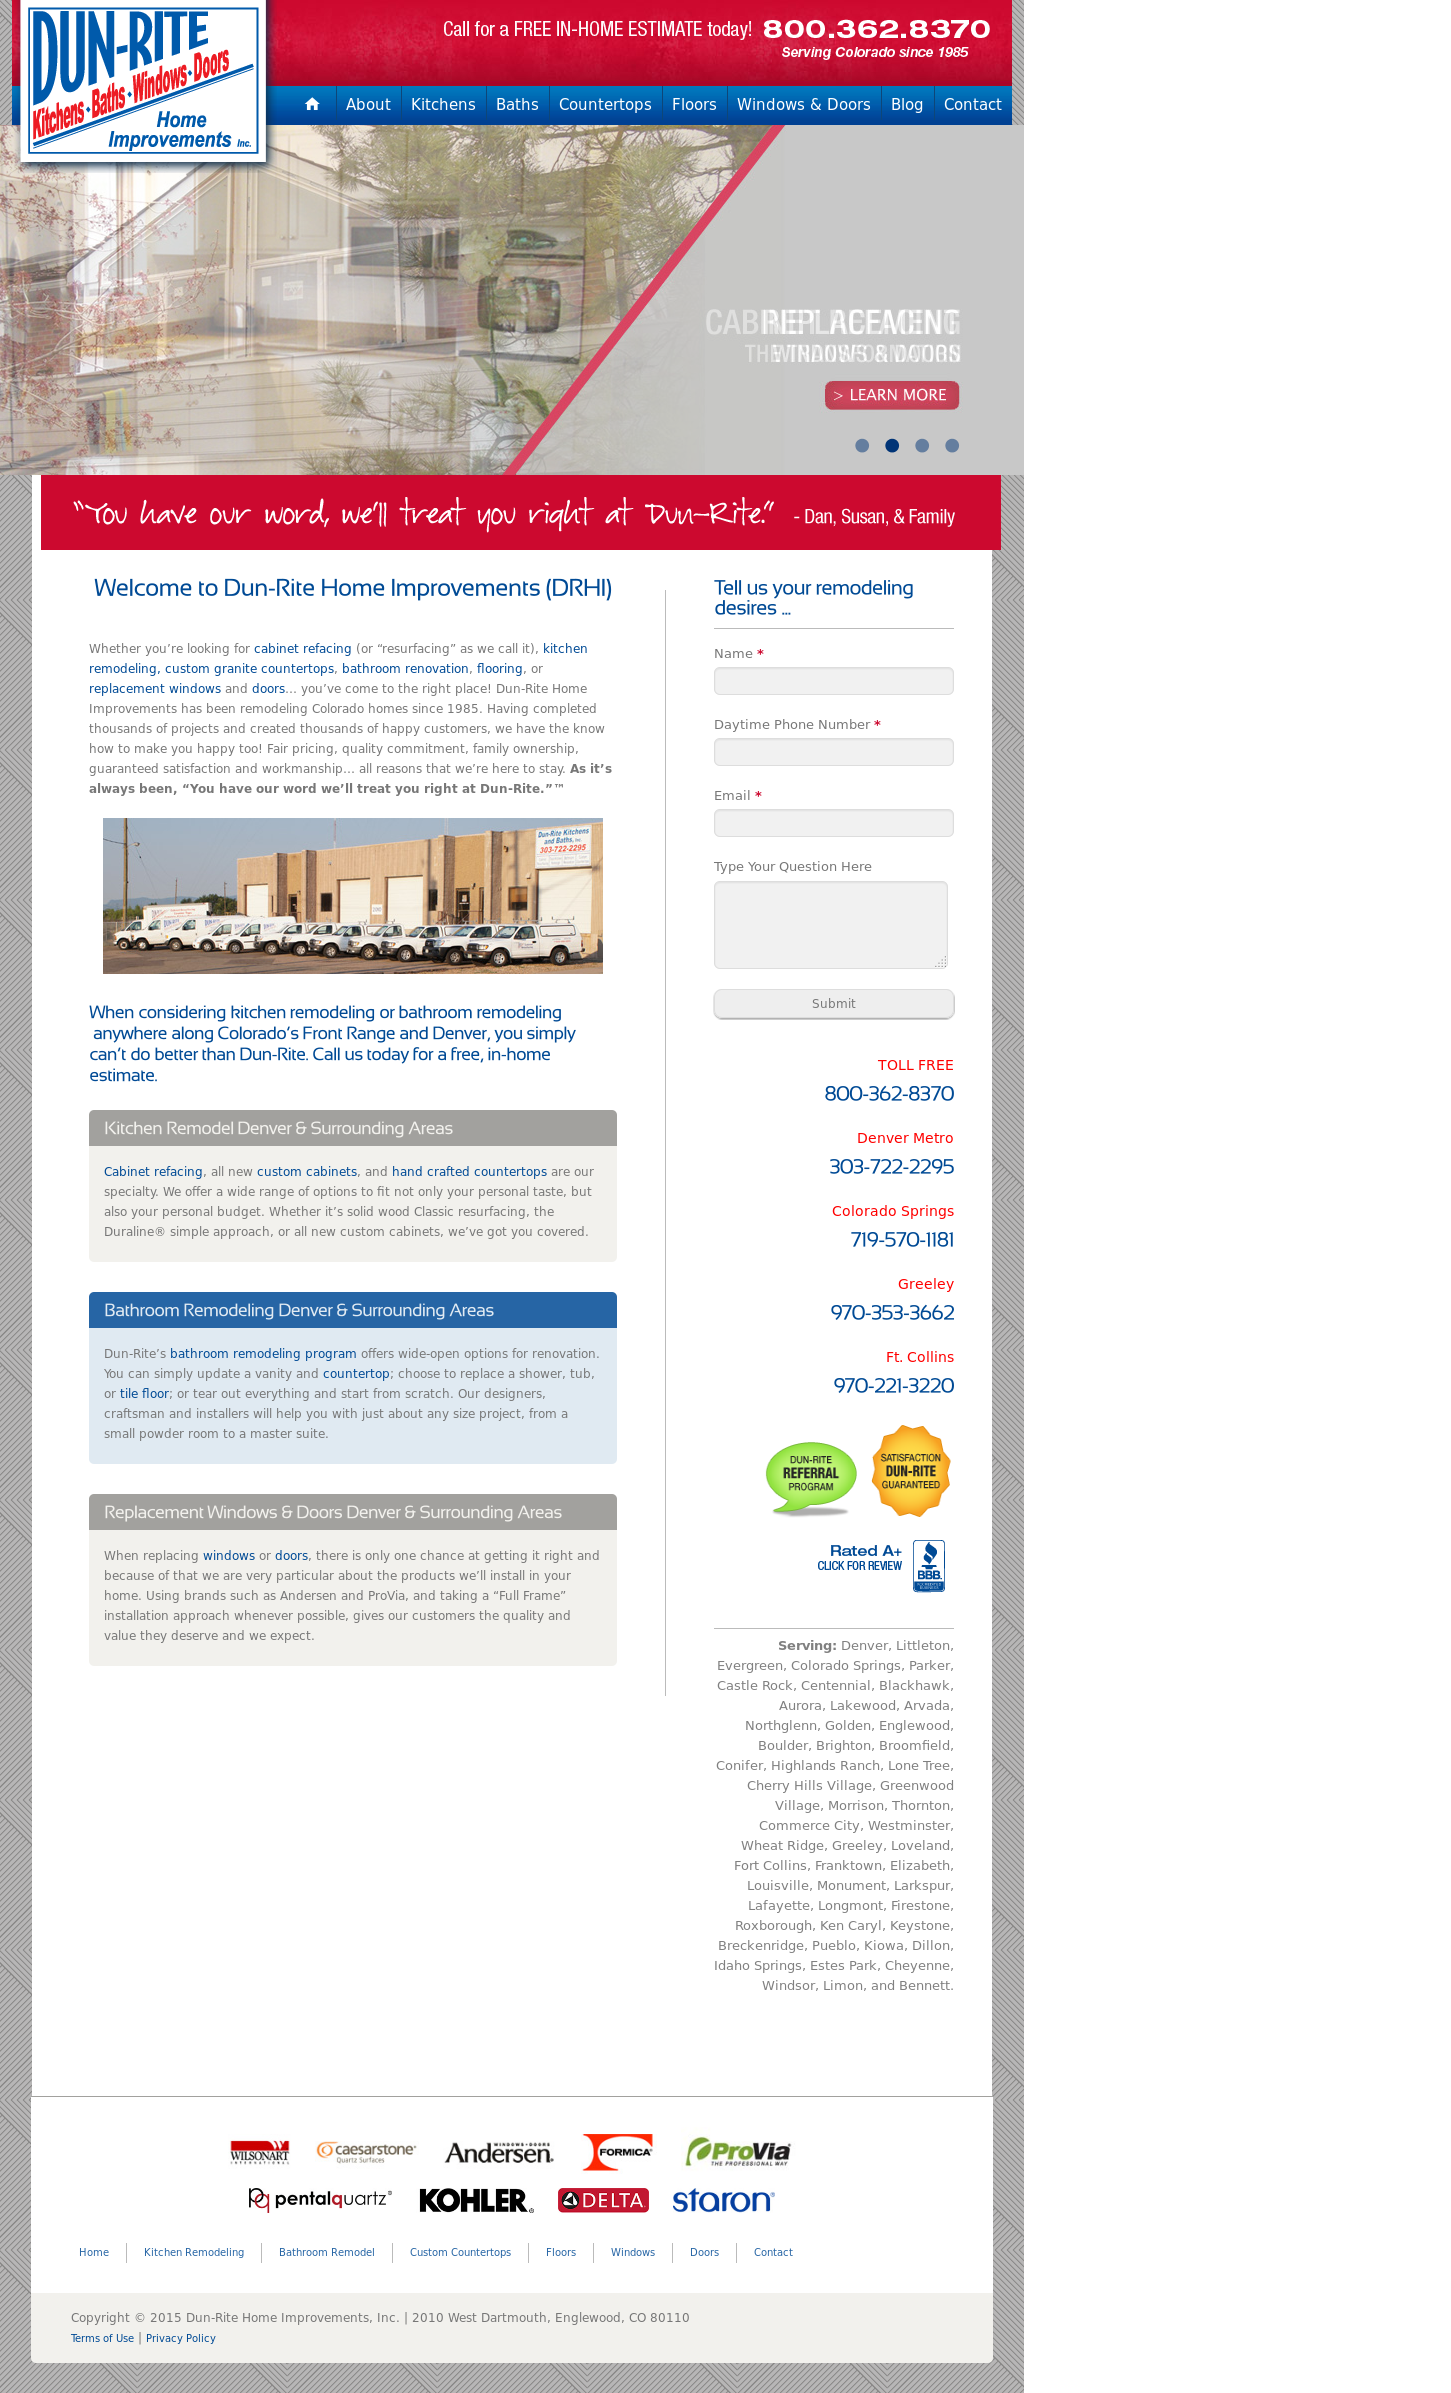 Dun-Rite Competitors, Revenue and Employees - Owler Company Profile